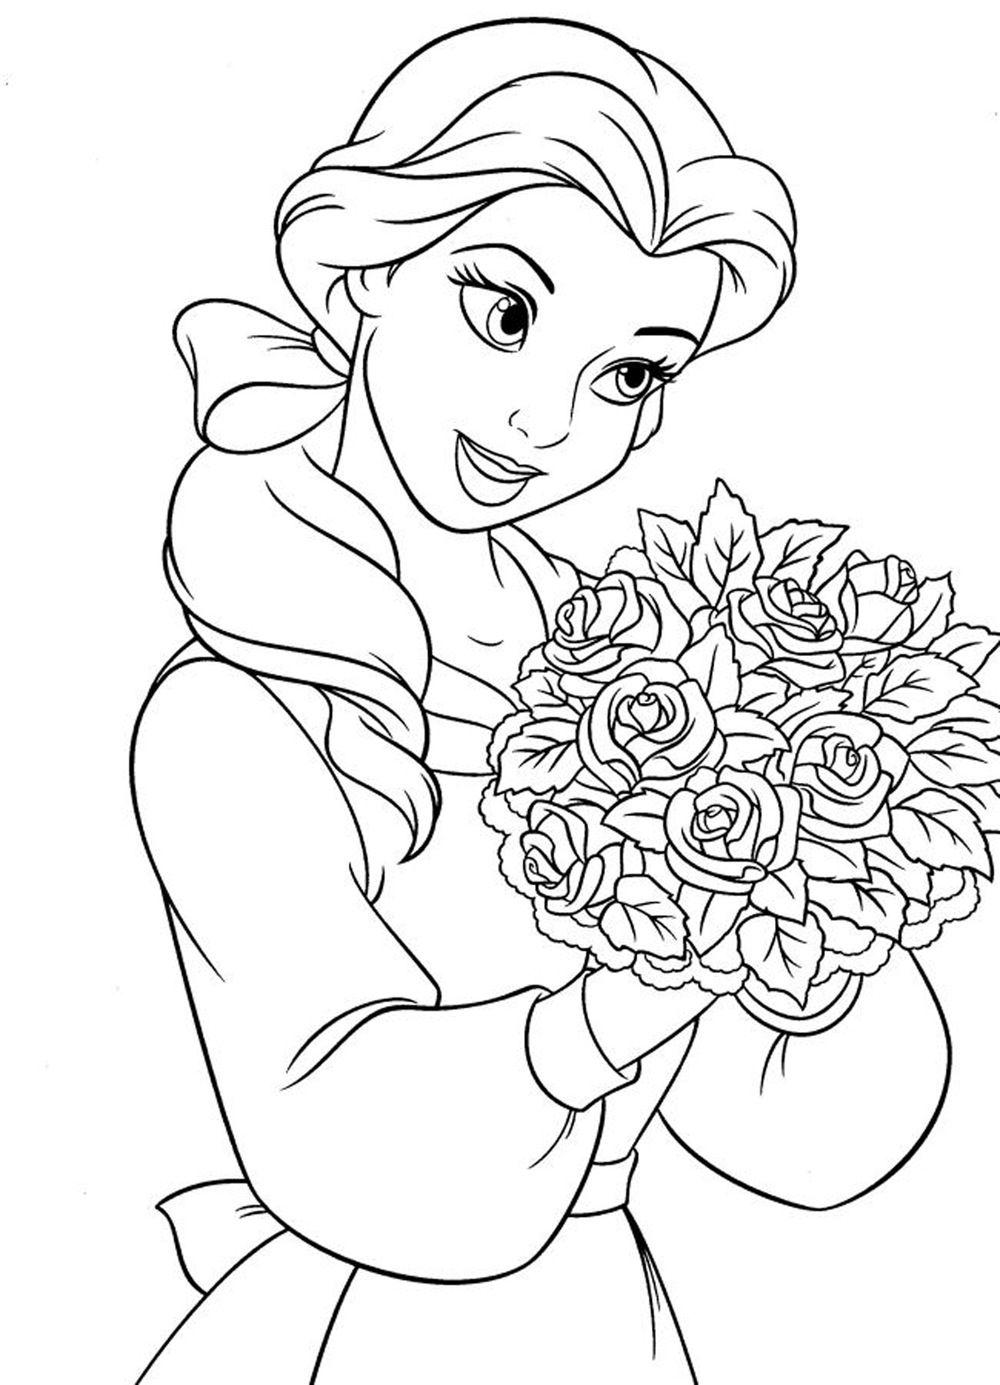 princess coloring page top 25 disney princess coloring pages for your little girl coloring princess page